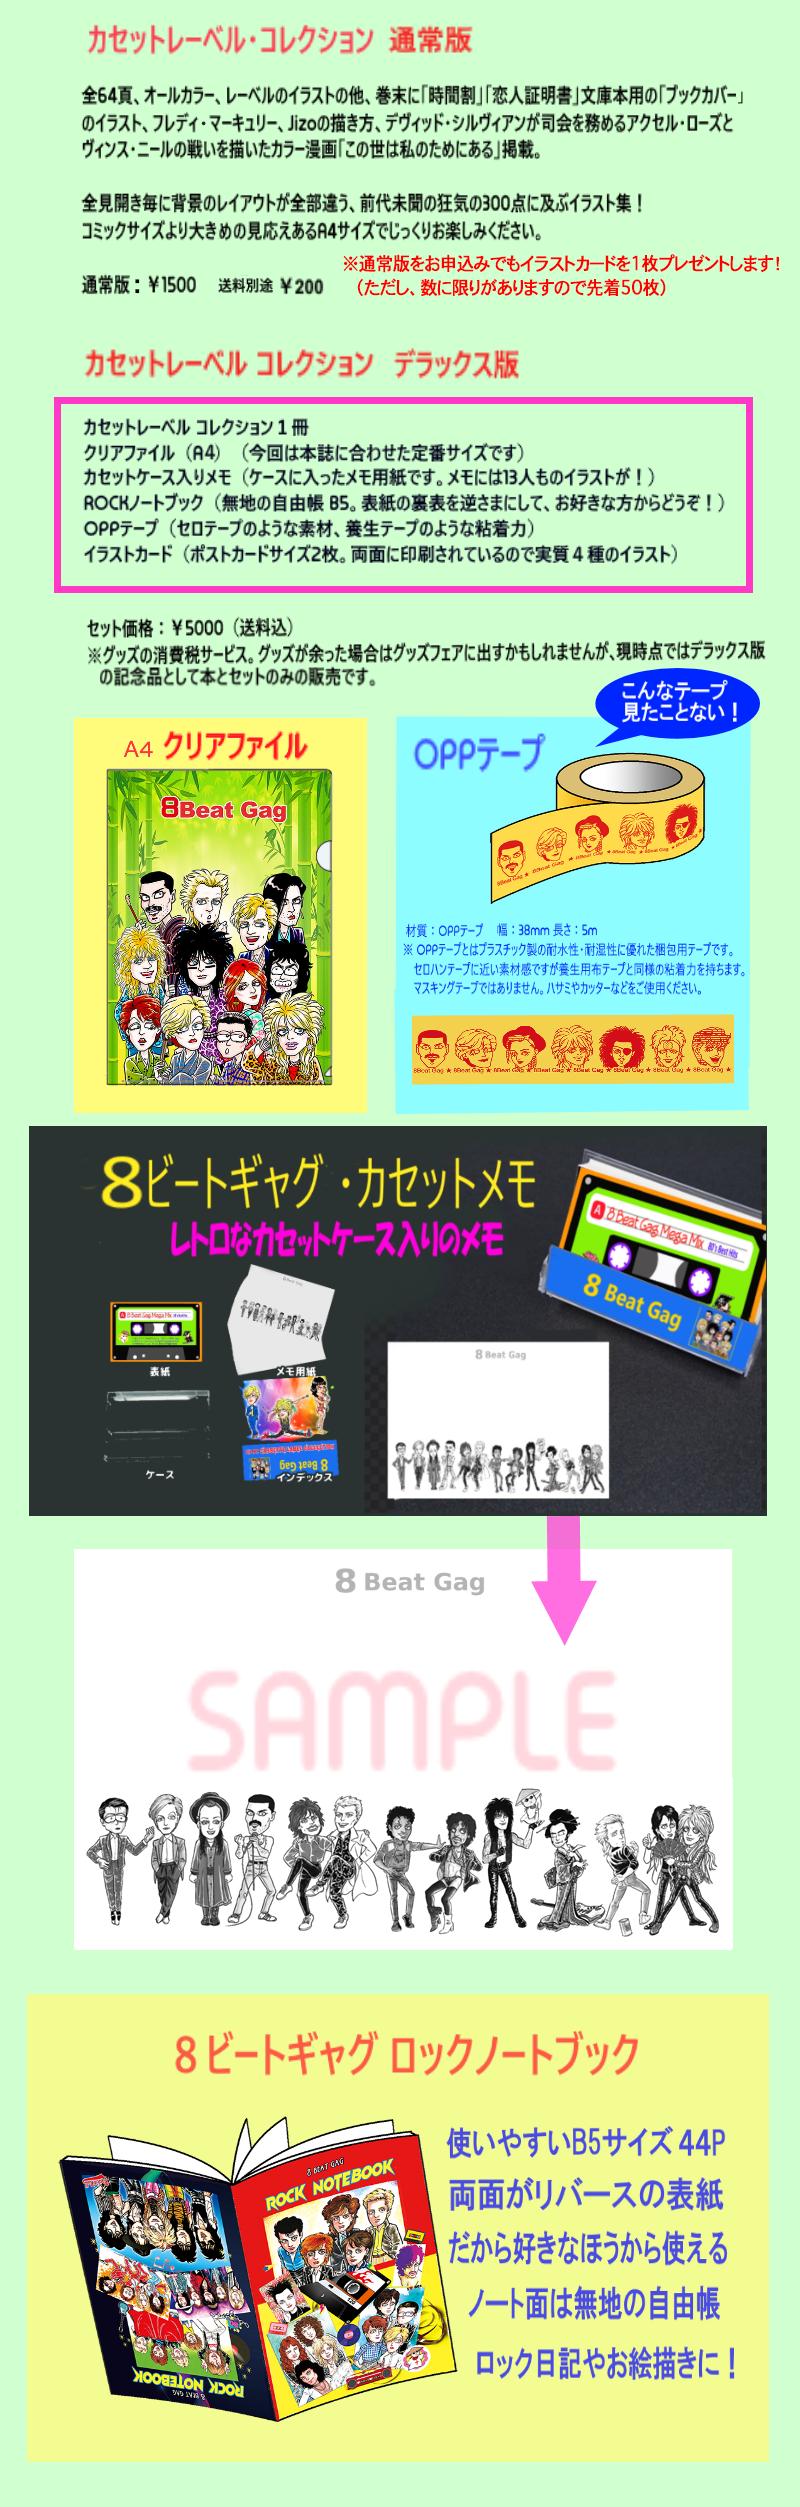 HP_Cassette_2'.png